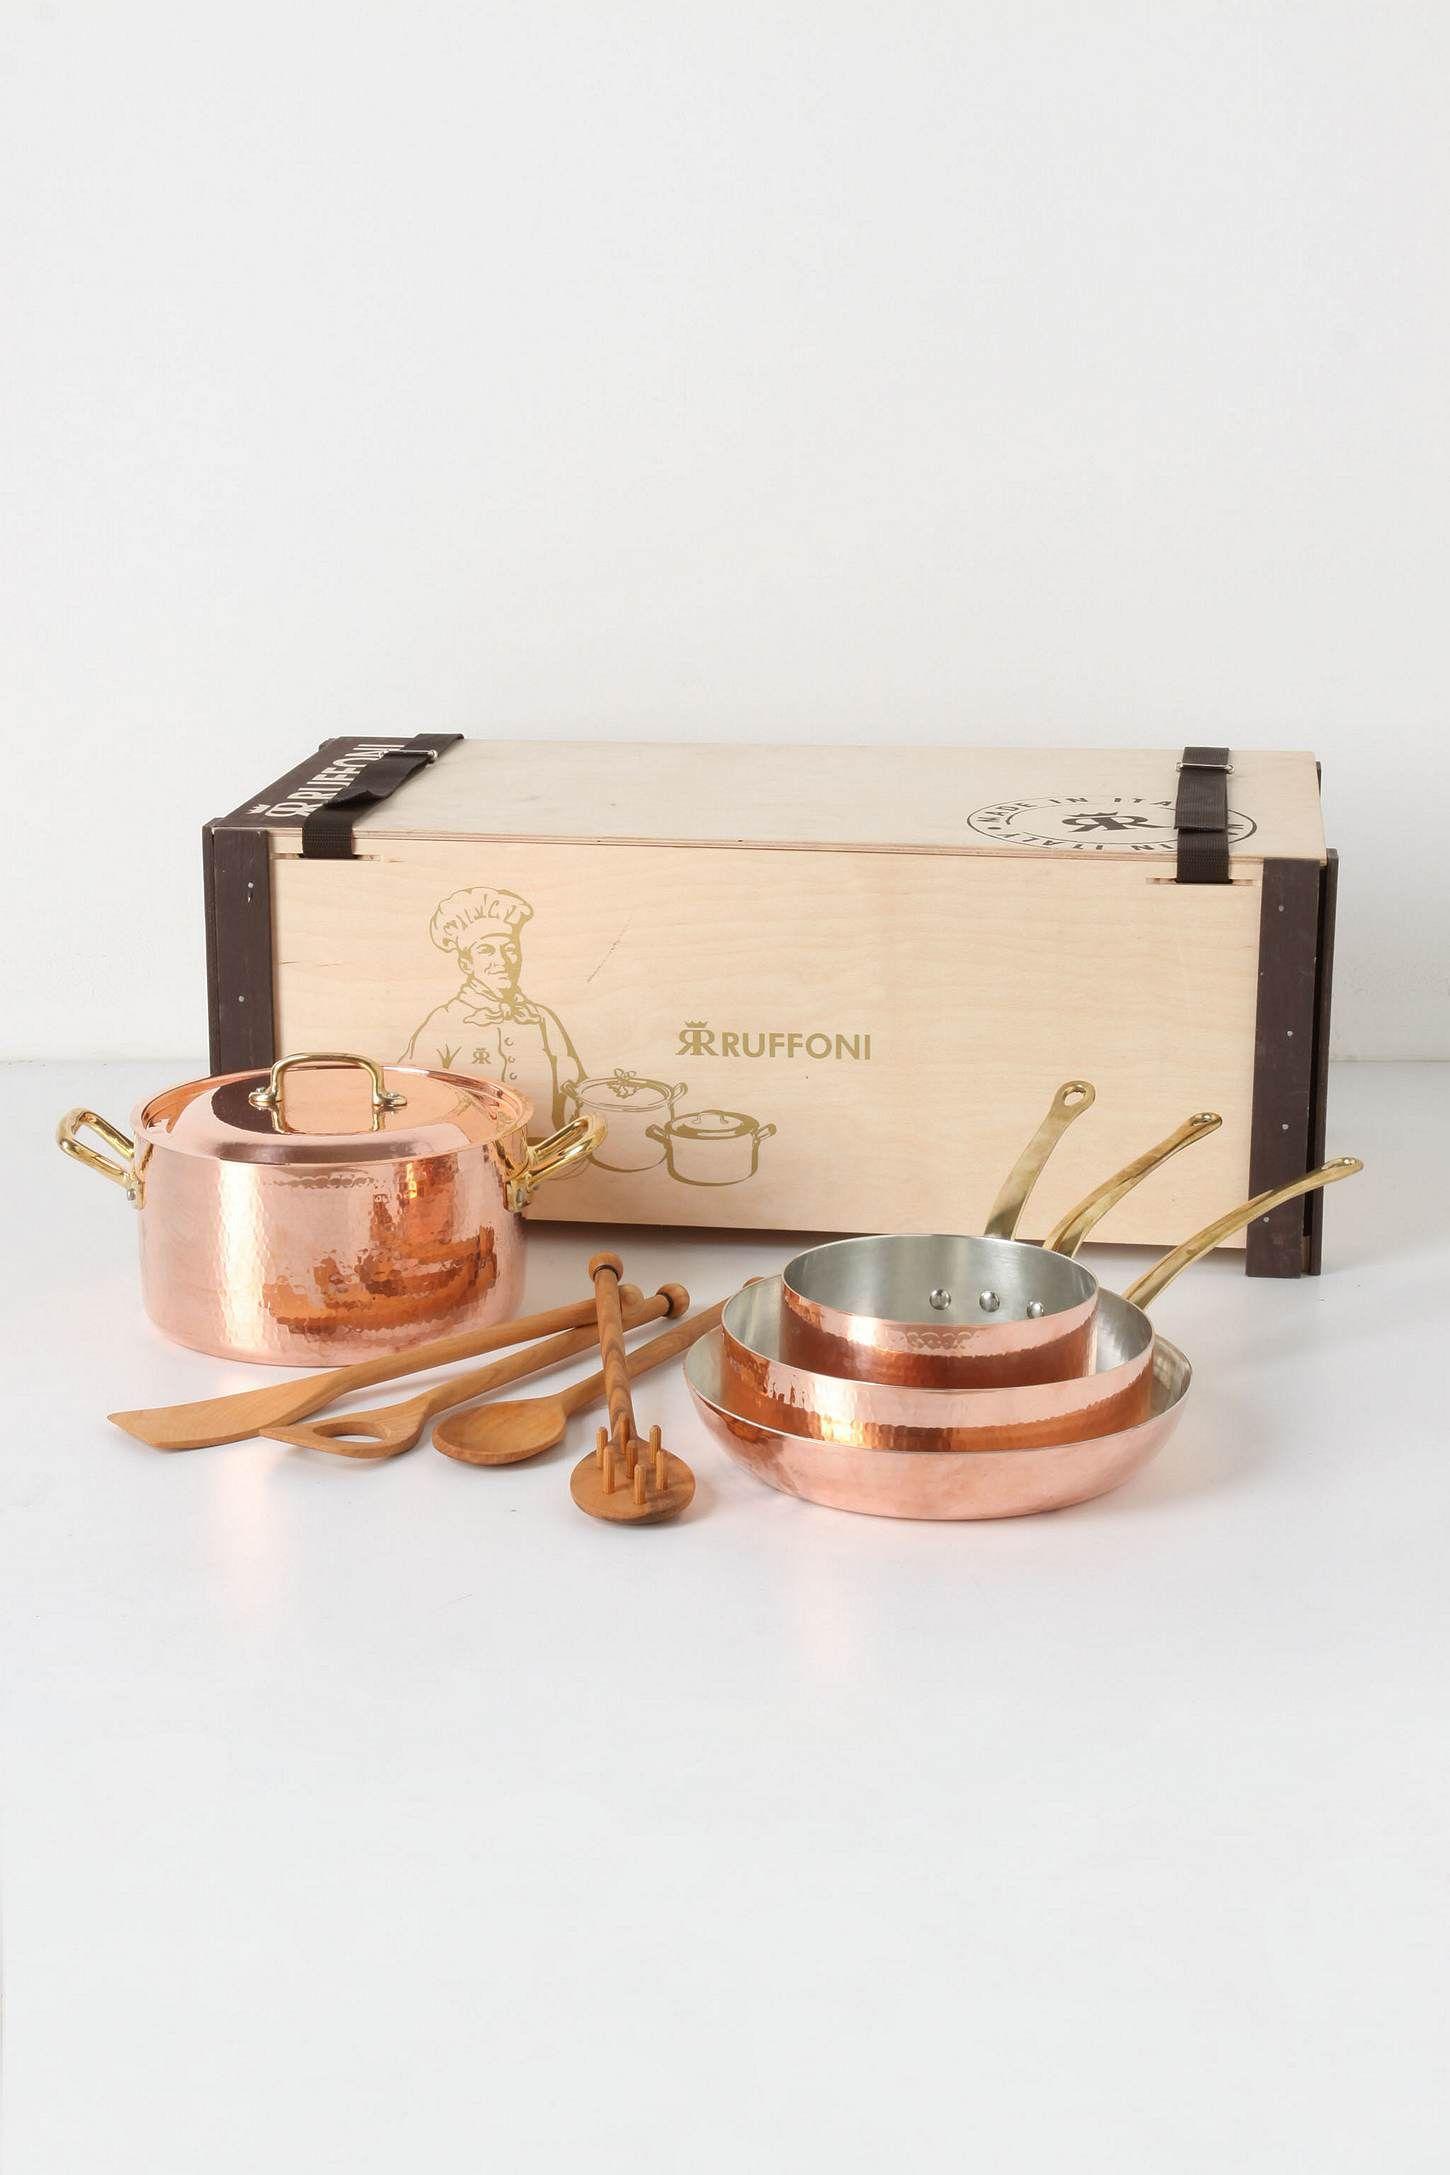 Ruffoni Copper Cookware Set Kitchy Kuche Kupfer Teller